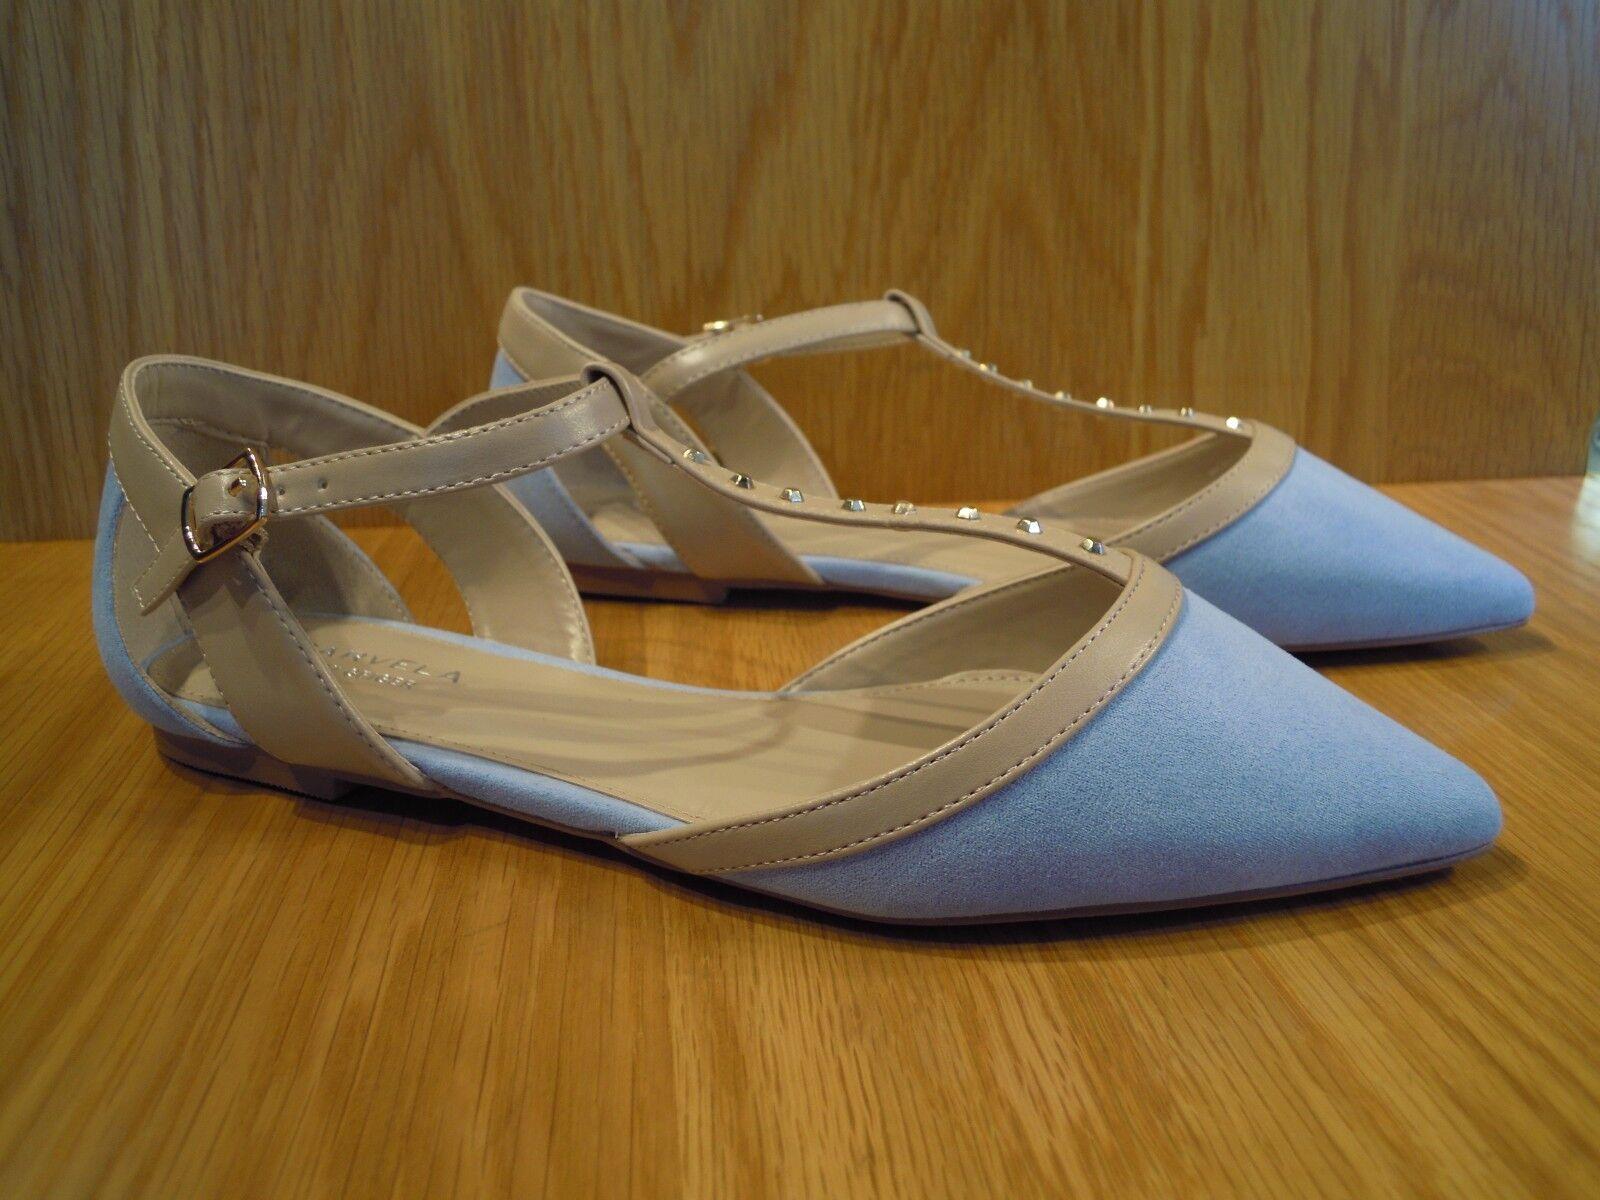 Carvela Ladies shoes Size 8 T Bar Flats Nude bluee Kurt Geiger Pointed Toe shoes